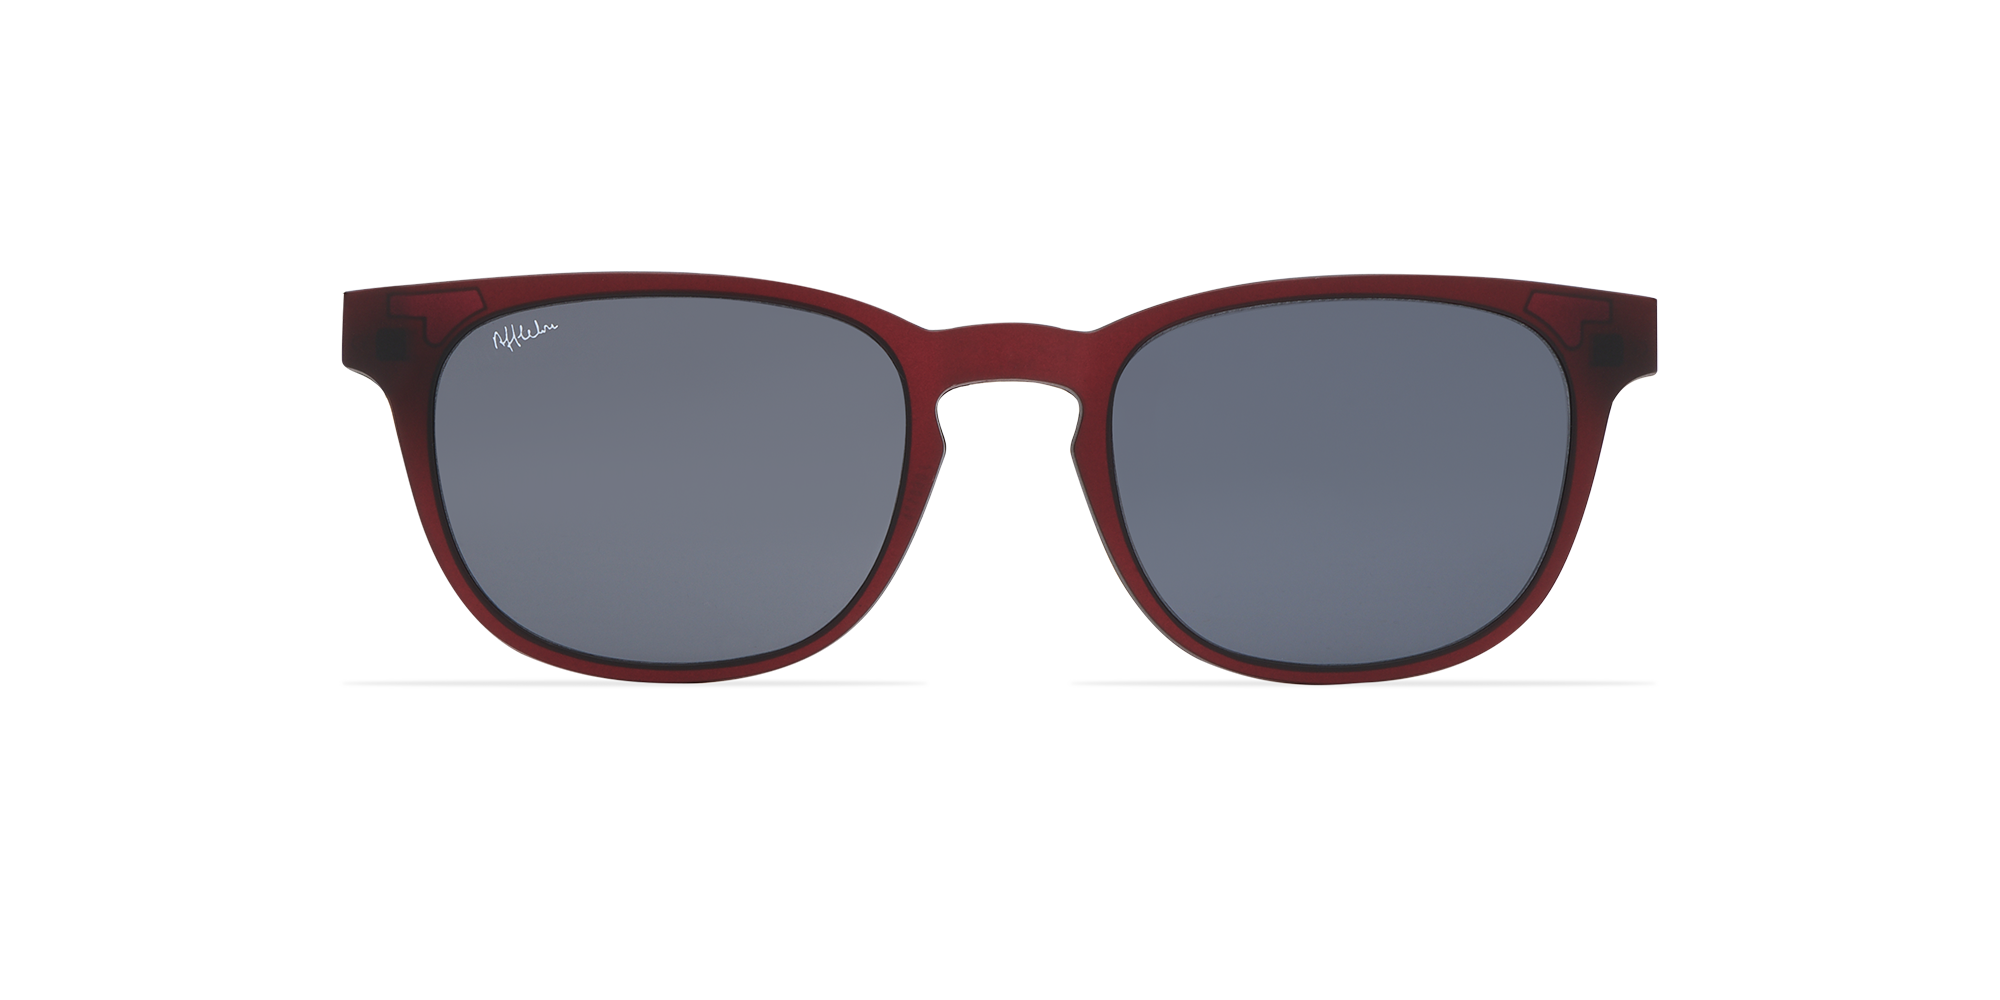 afflelou/france/products/smart_clip/clips_glasses/TMK33SURD015120.png